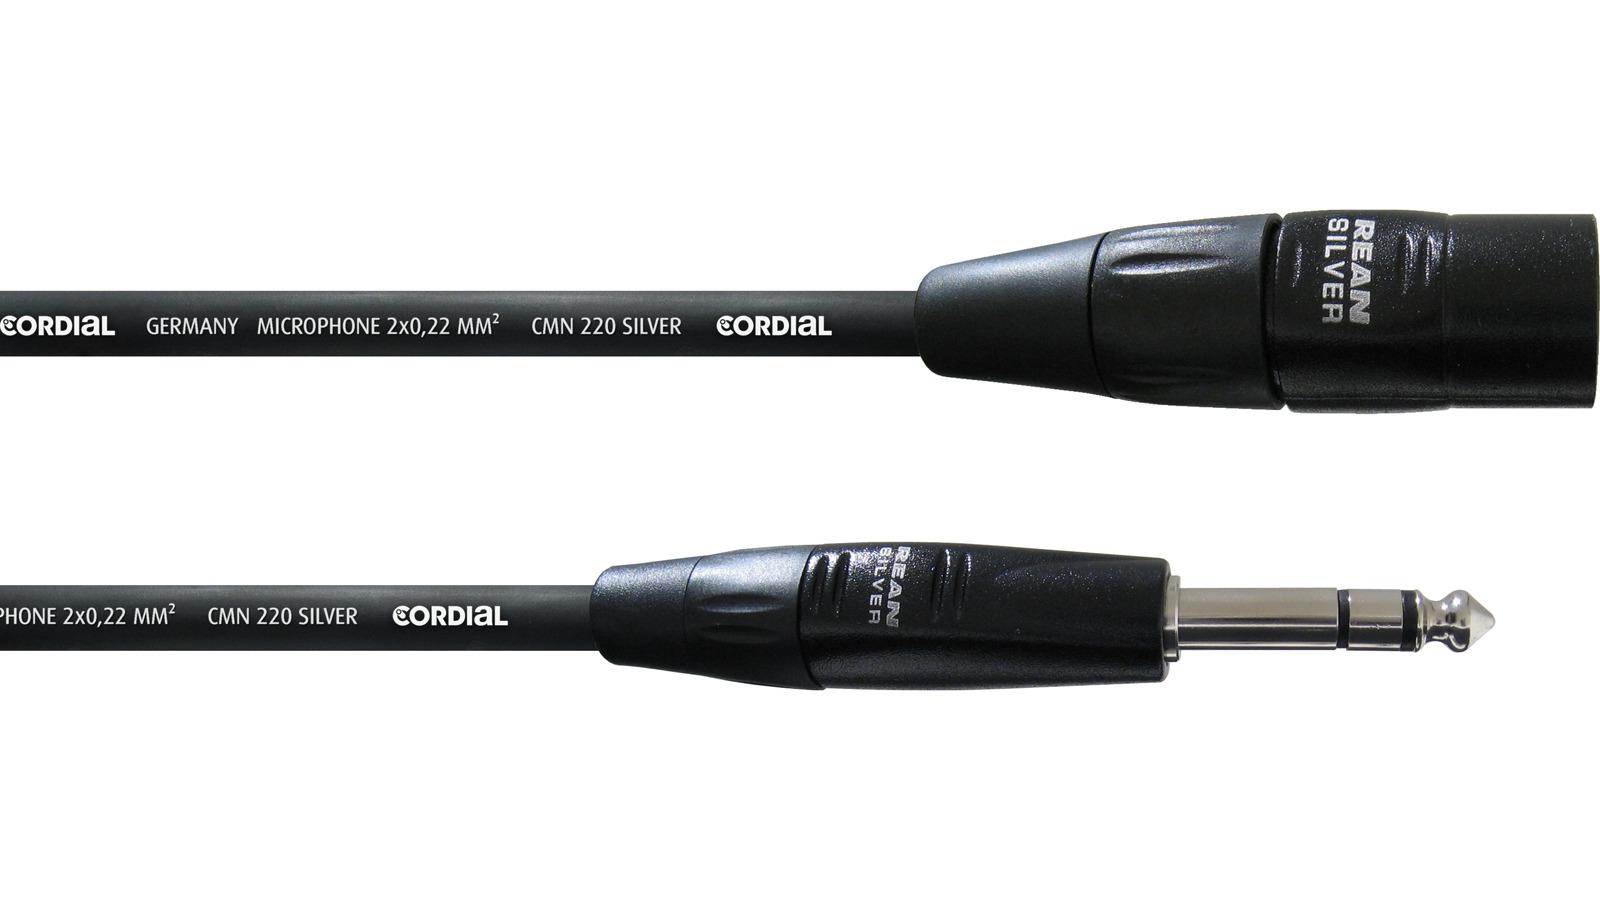 Cordial symmetrisches Kabel 9 m CIM 9 MV